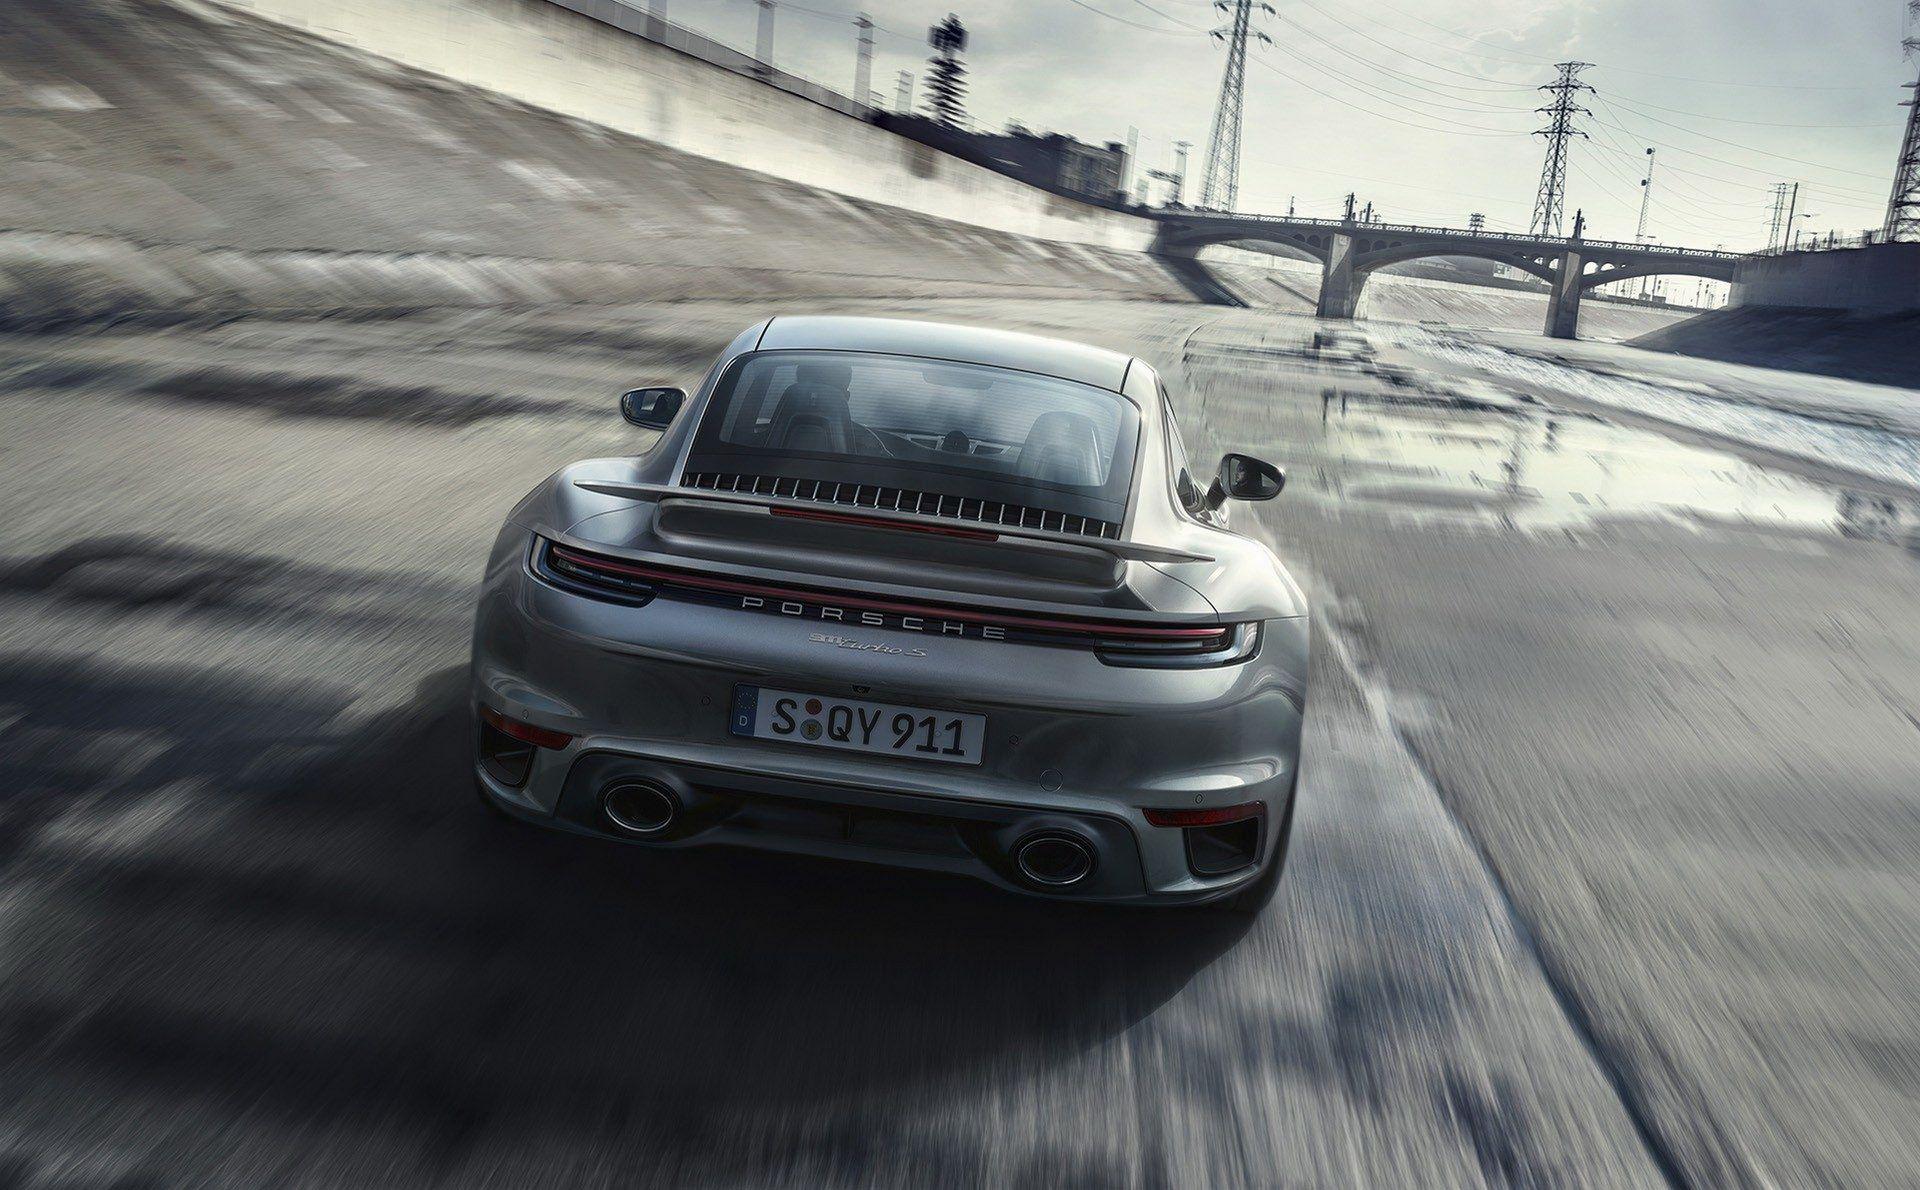 Porsche-911-Turbo-S-2020-33